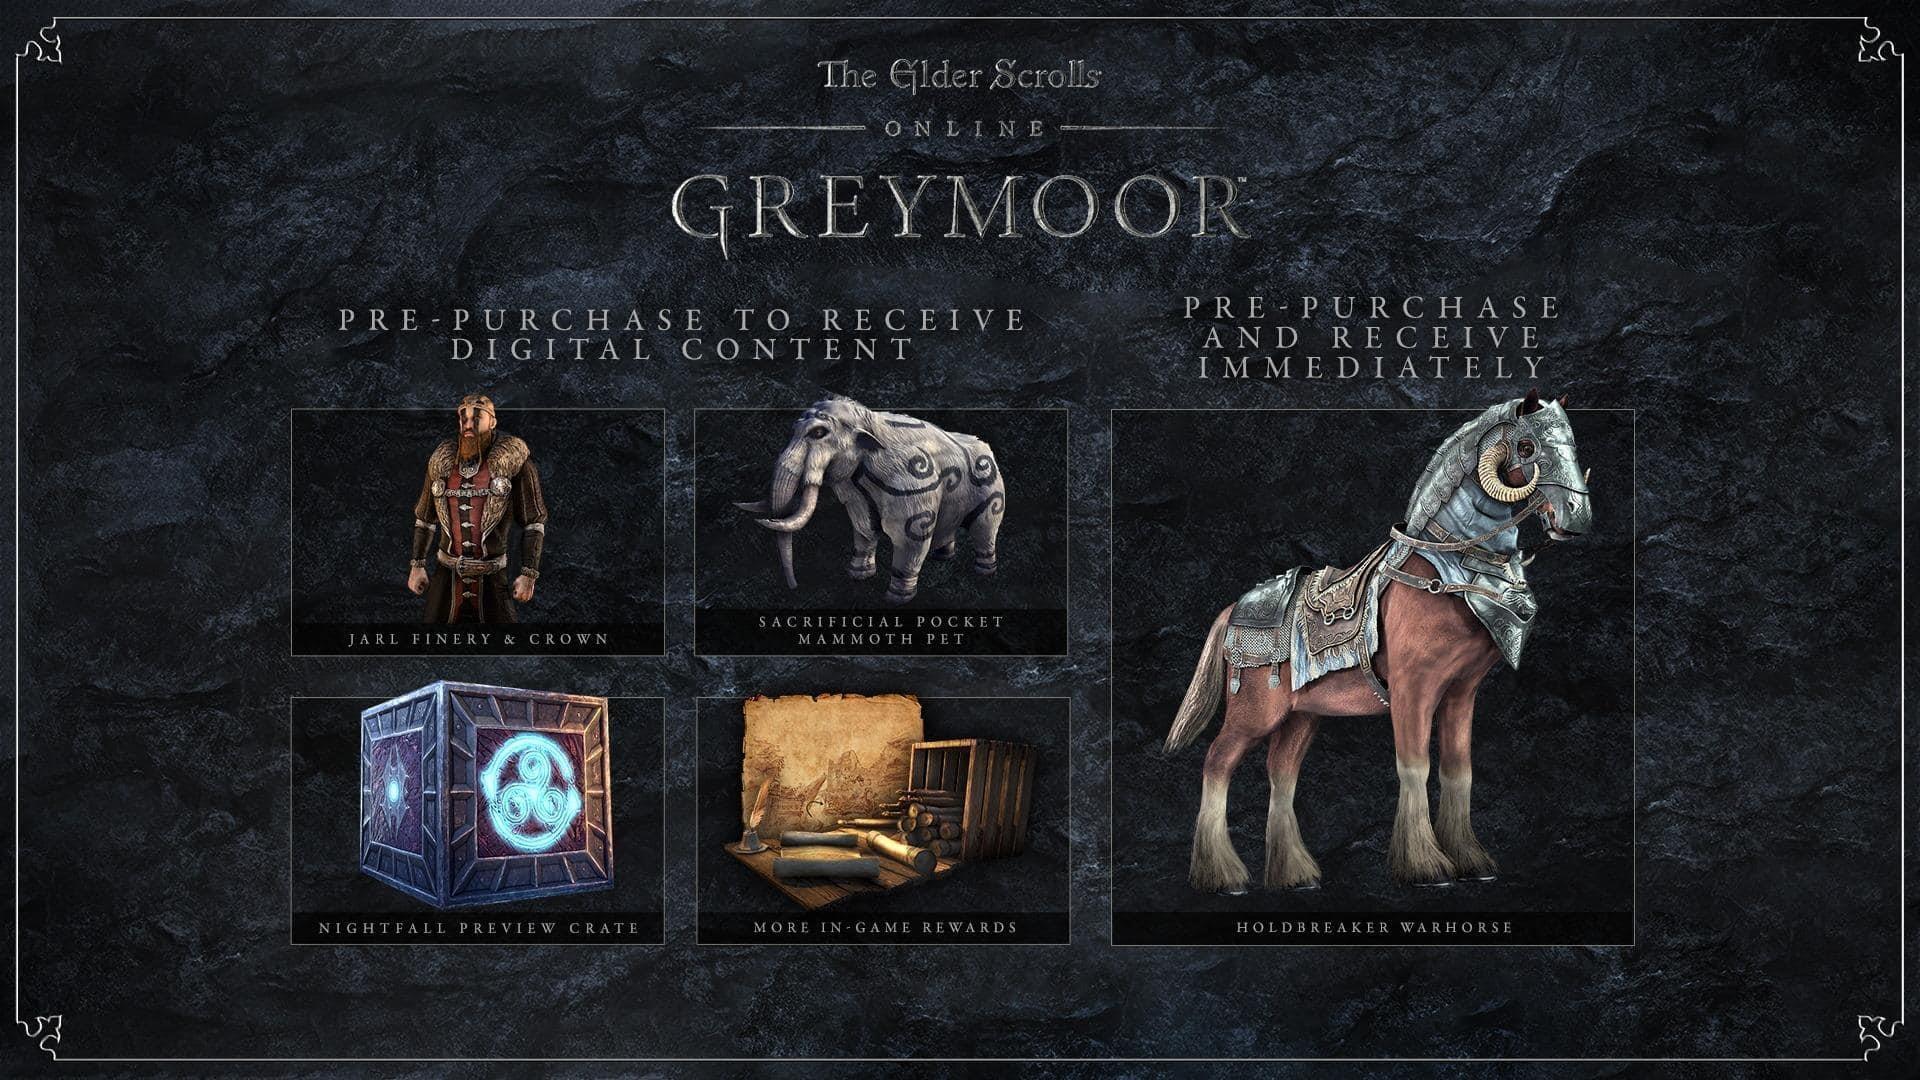 Pre-order Greymoor